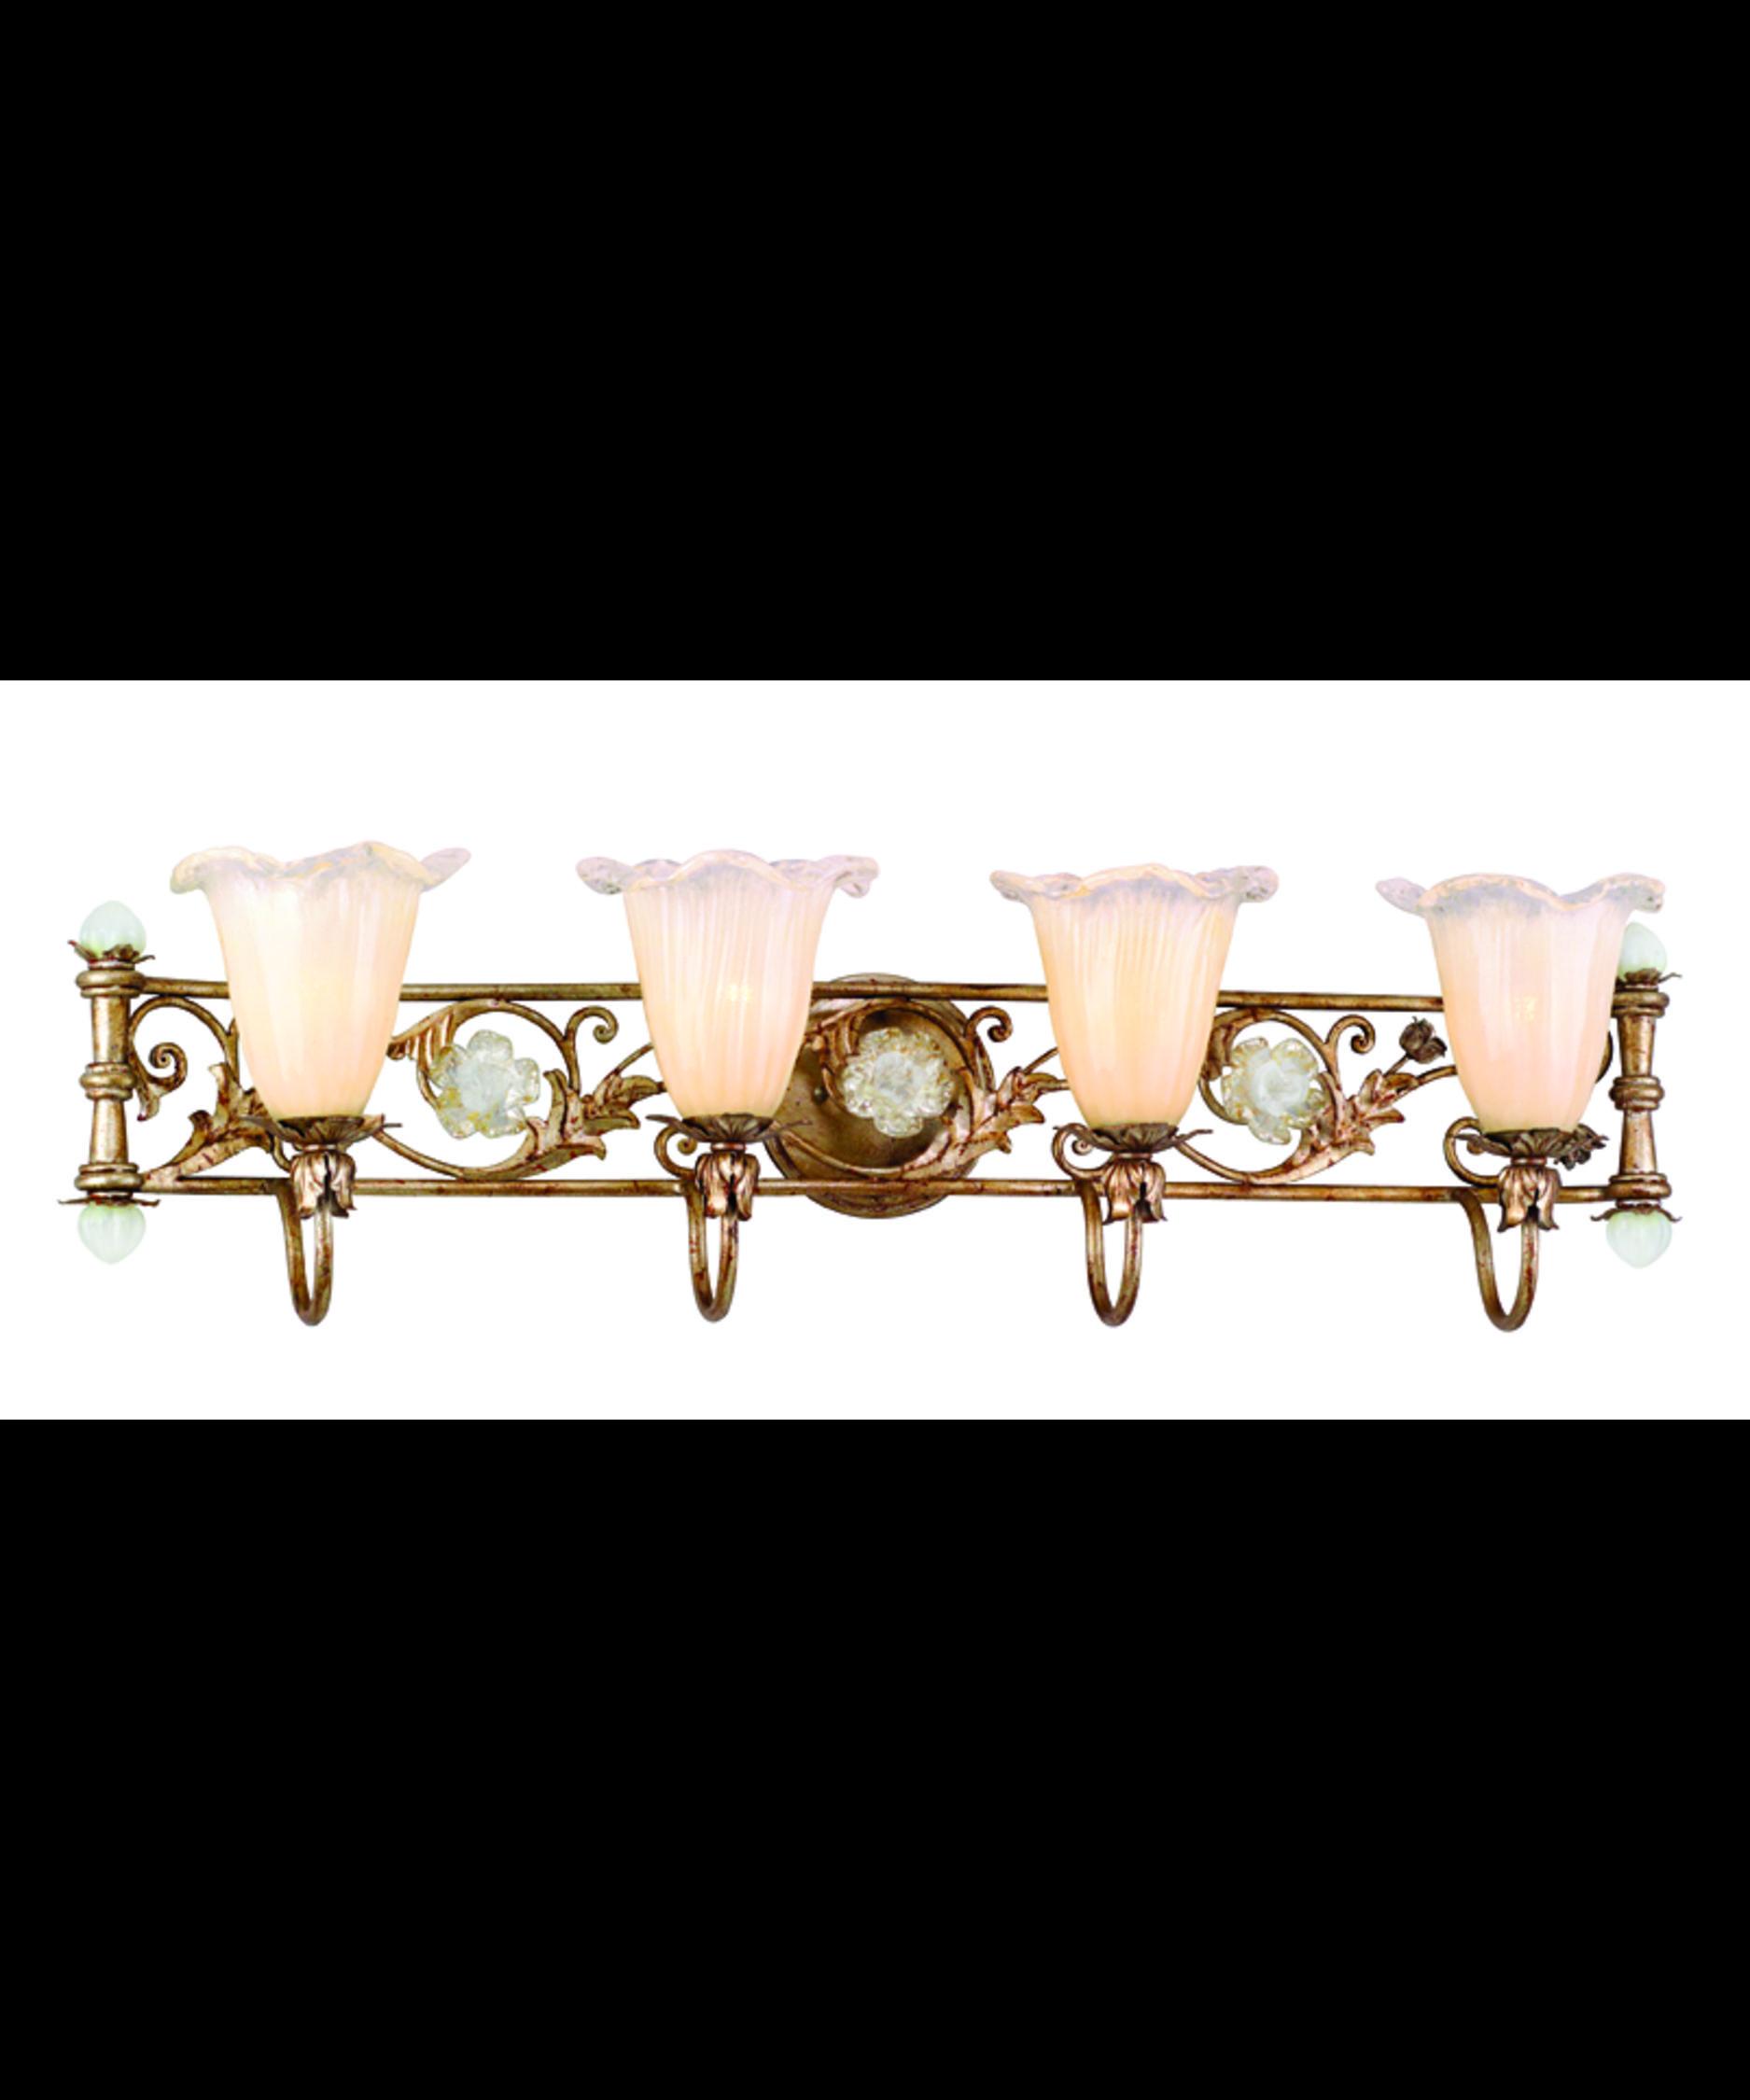 Corbett Lighting 64 64 Fiori 36 Inch Bath Vanity Light Capitol Lighting 1